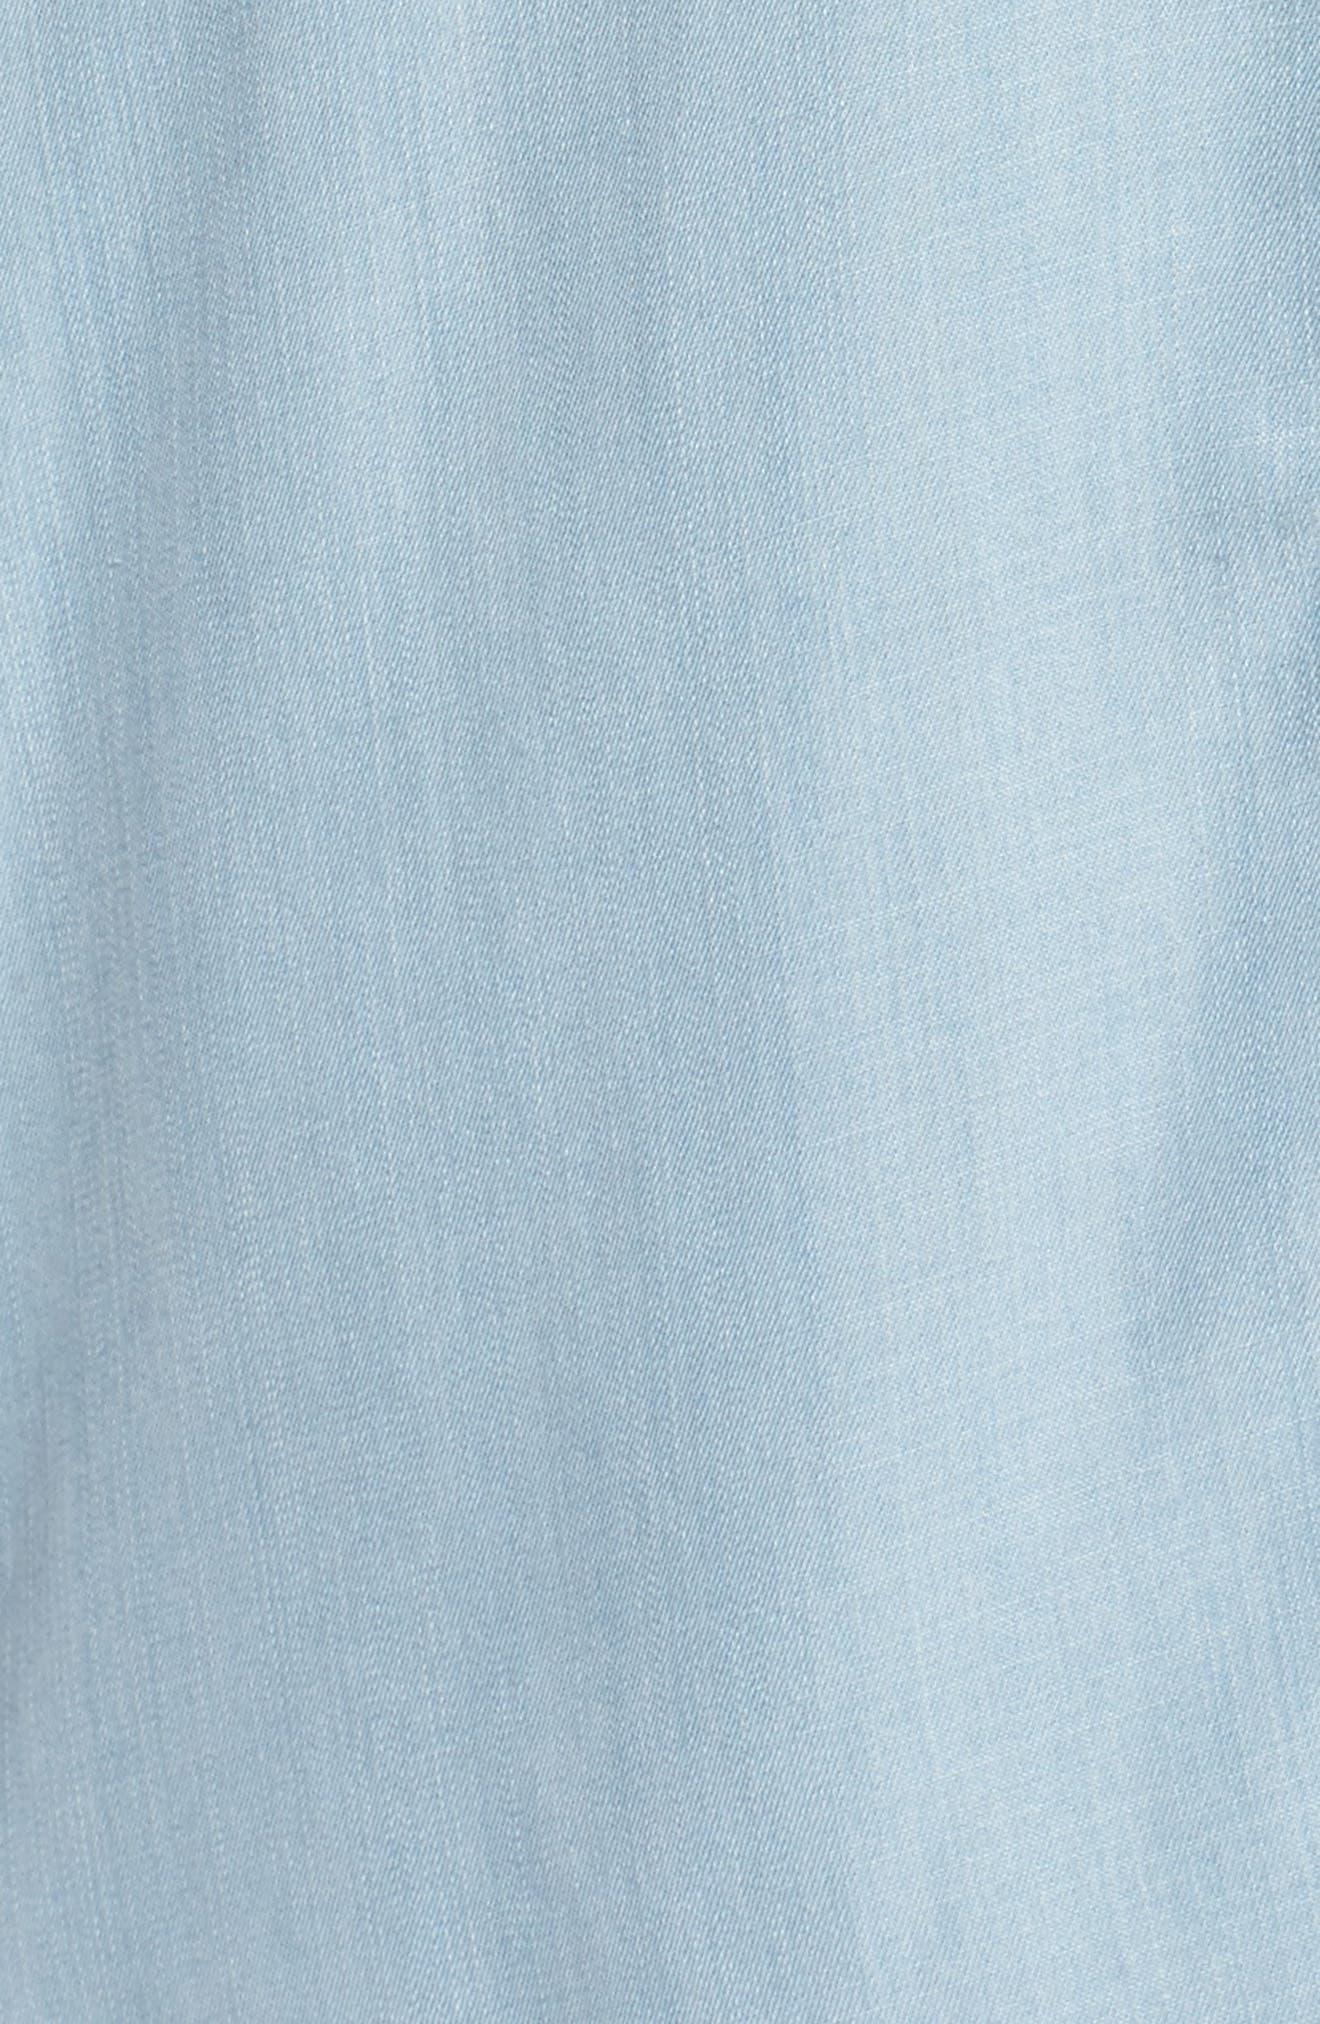 Brantley Indigo Shirtdress,                             Alternate thumbnail 5, color,